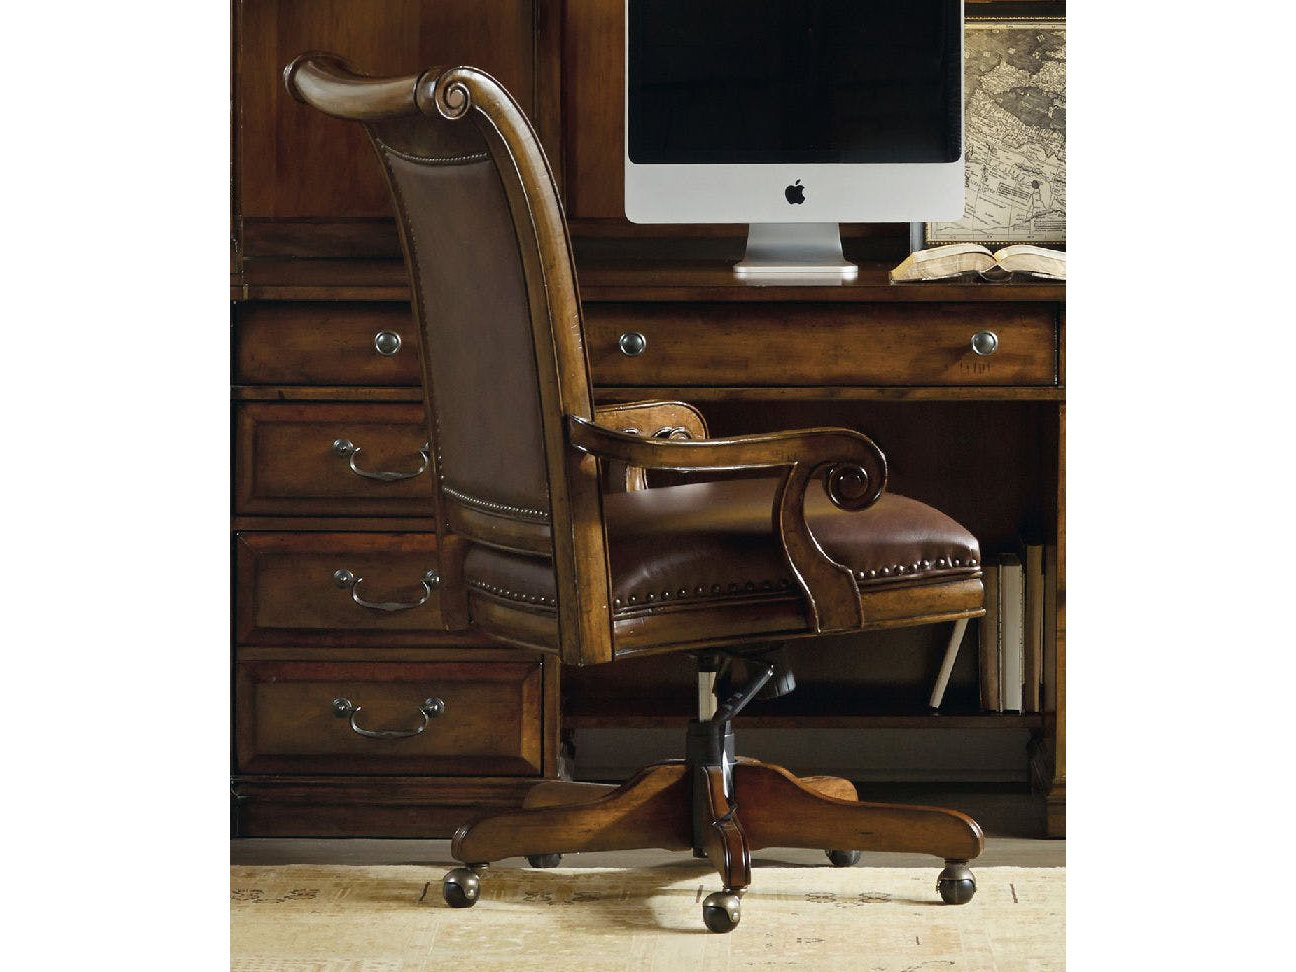 Hooker Furniture Tynecastle Medium Wood Computer Tilt Swivel Executive Chair